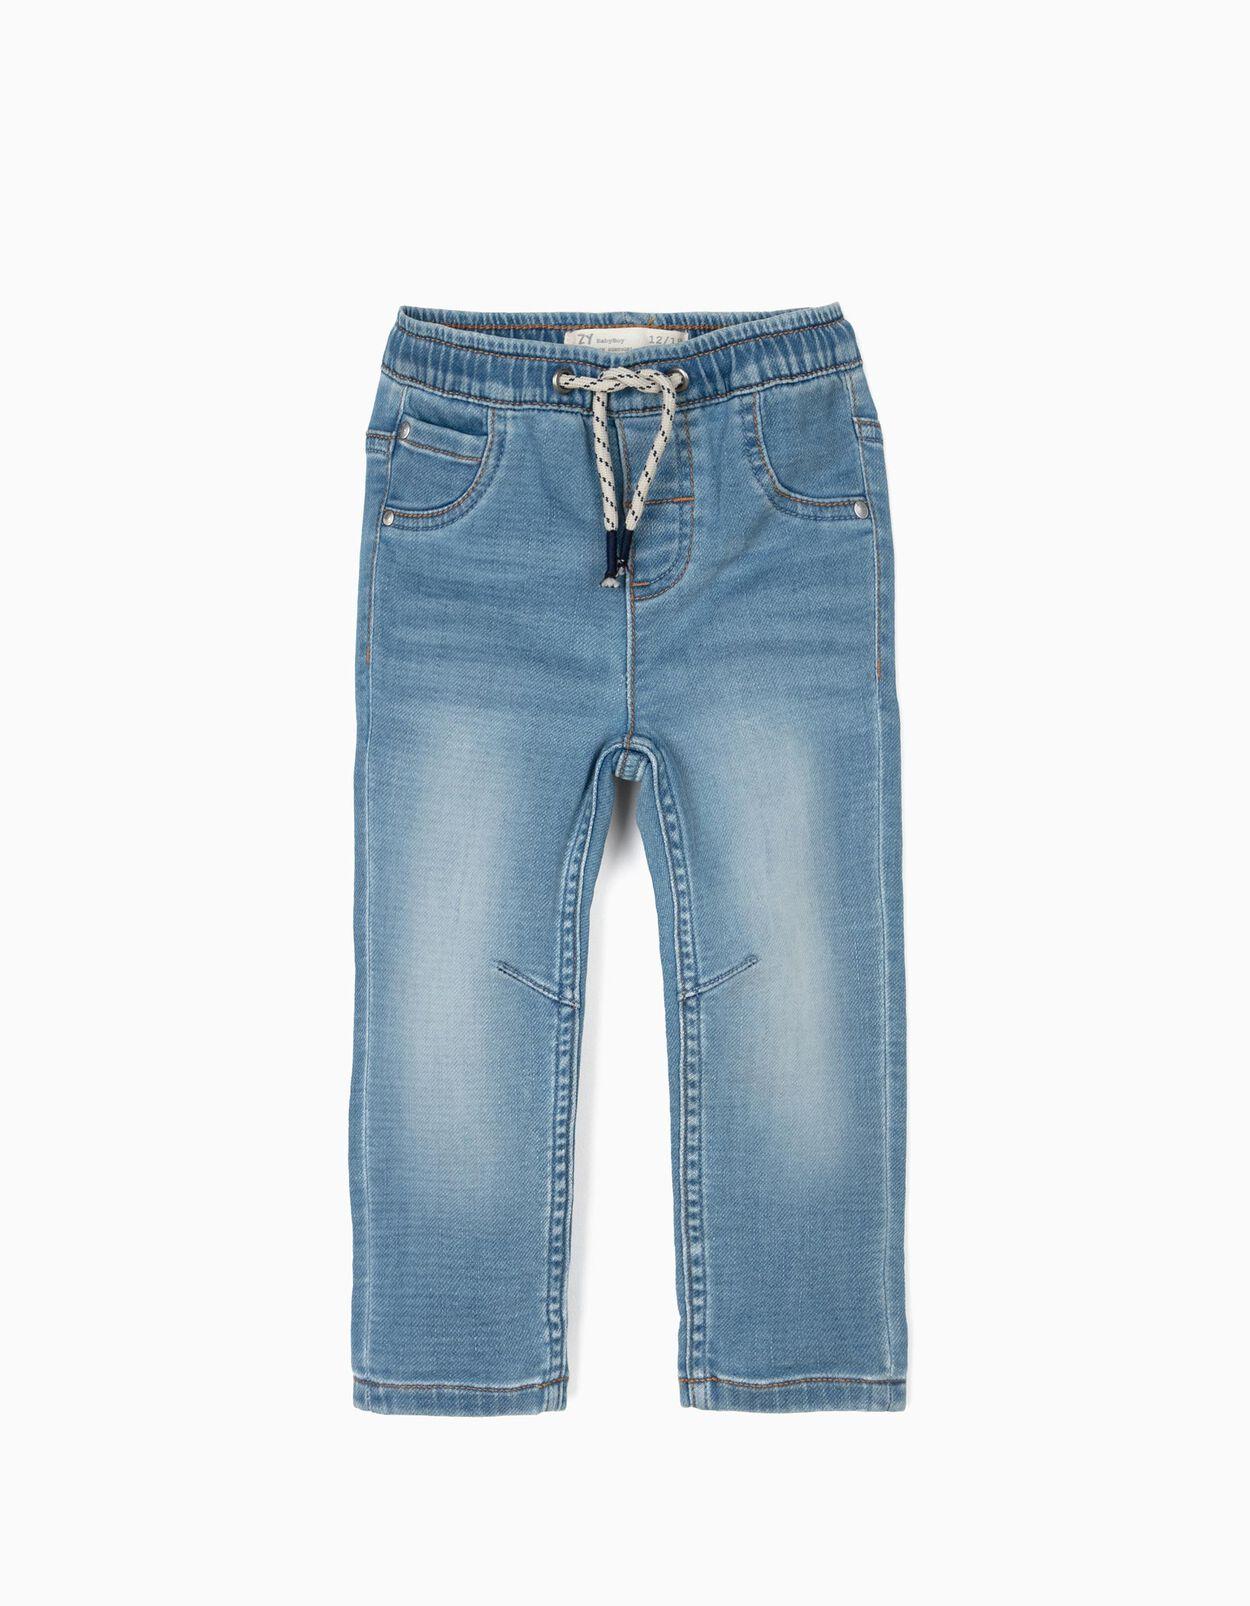 ZIPPY Baby Boys Jeans